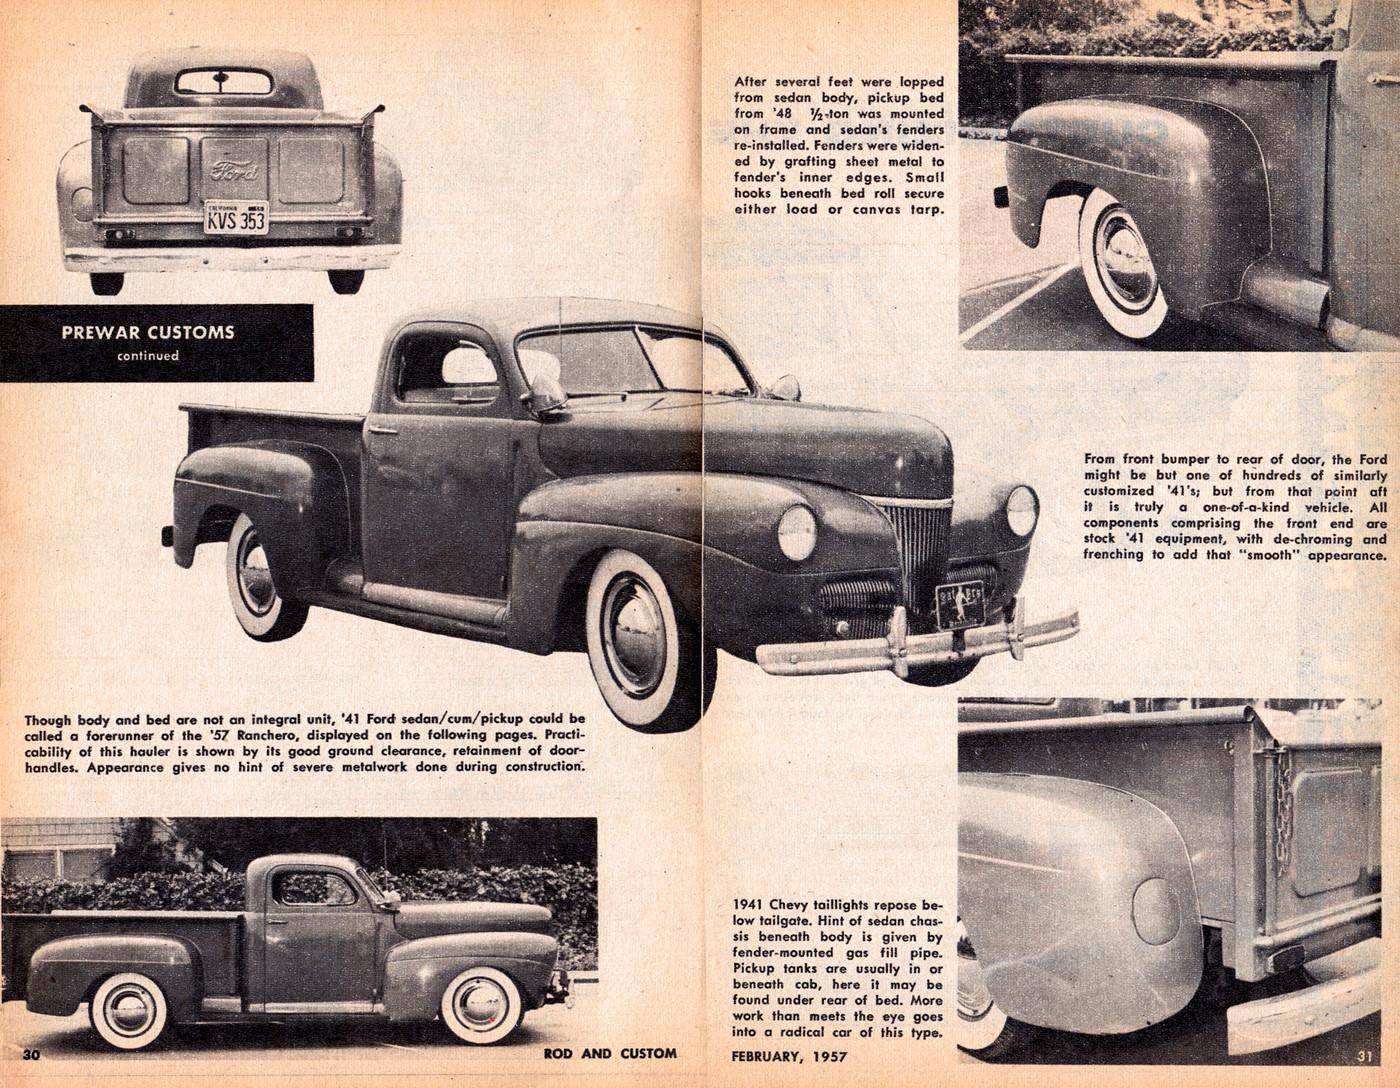 Jack Rushton 1941 Ford Sedan Turned Pick Up Album Rik Hoving Truck Front Fenders Custom Car Photo Archive Fotkicom And Video Sharing Made Easy